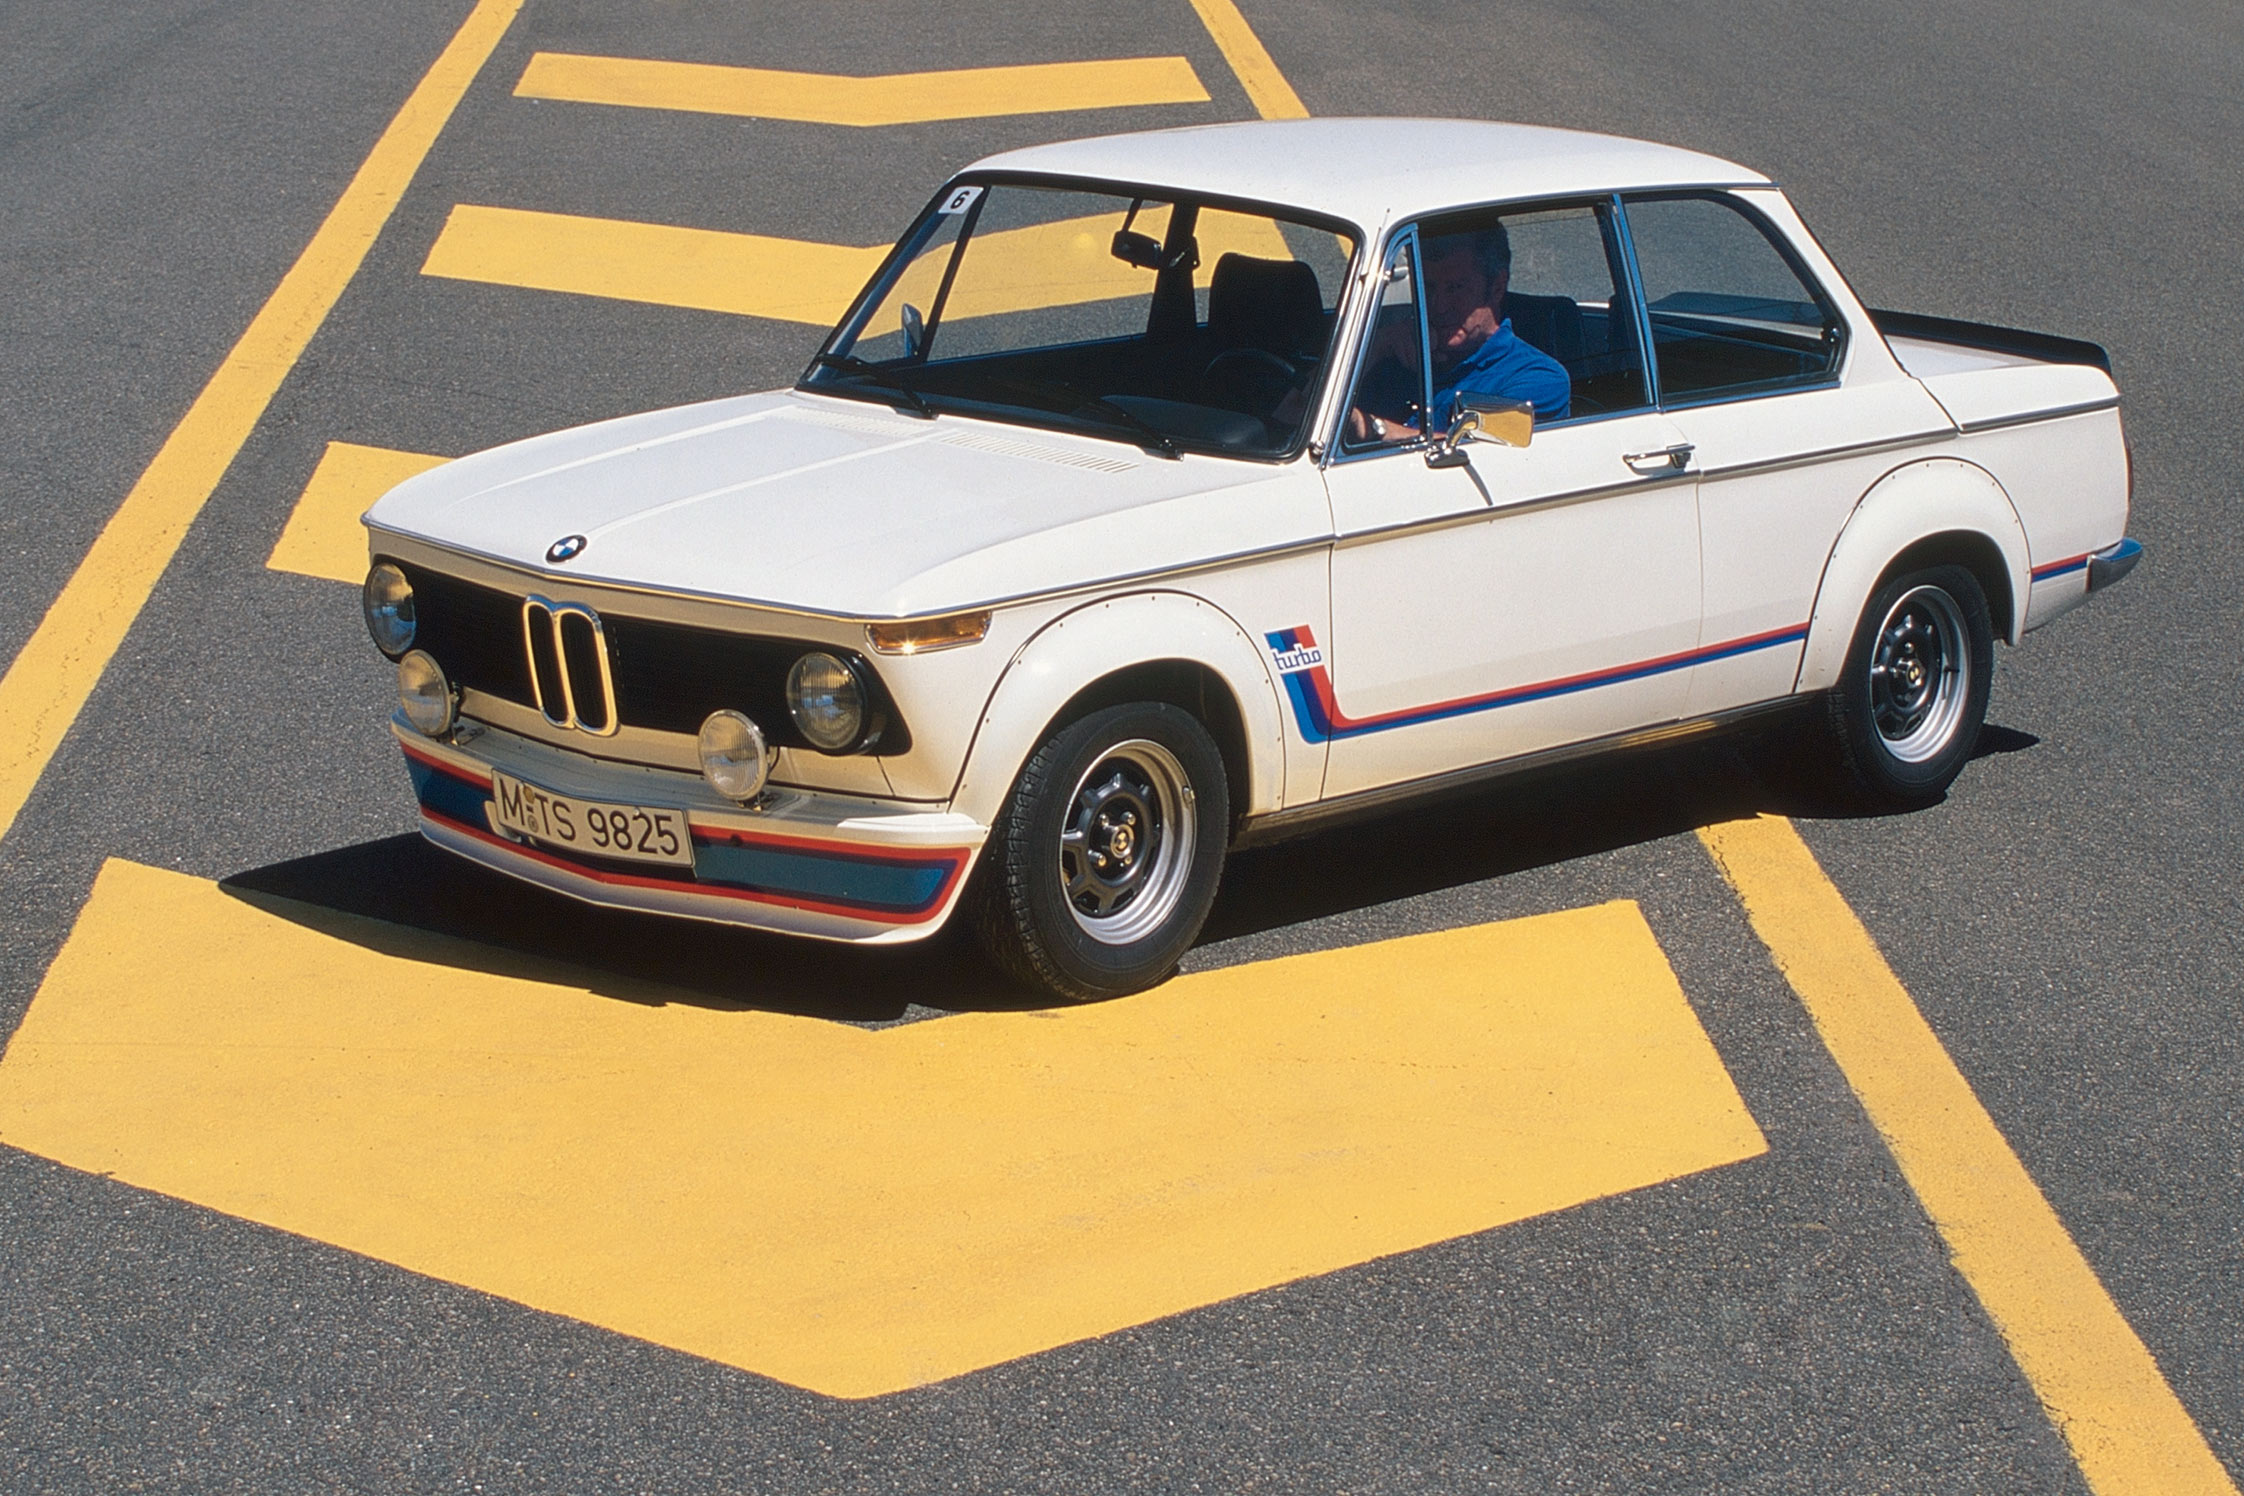 photo bmw 2002 turbo e20 coup 1973 m diatheque